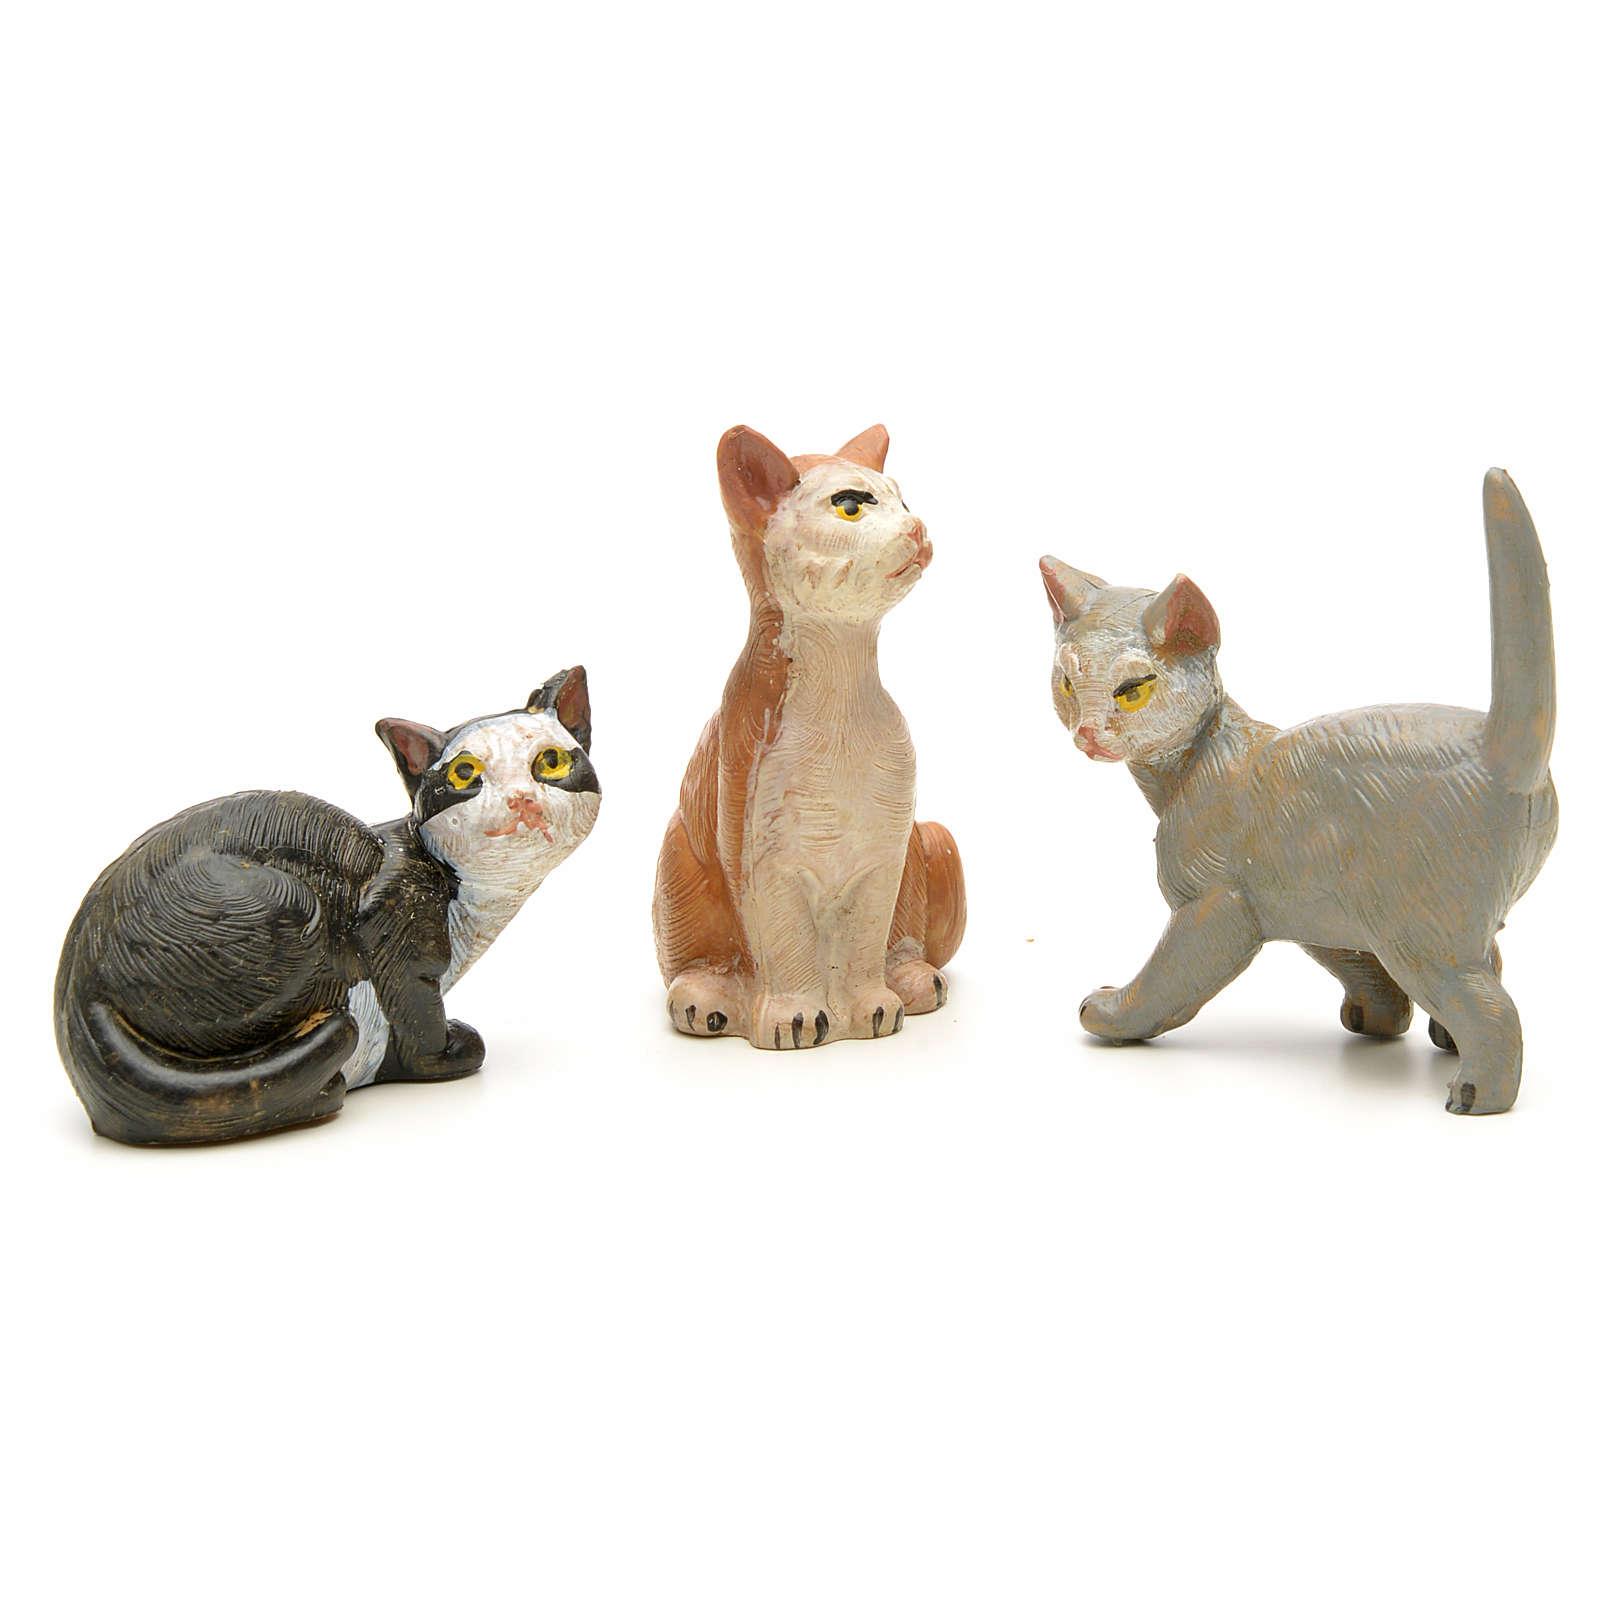 Chats pour crèche 12 cm Fontanini, 3 pcs 4